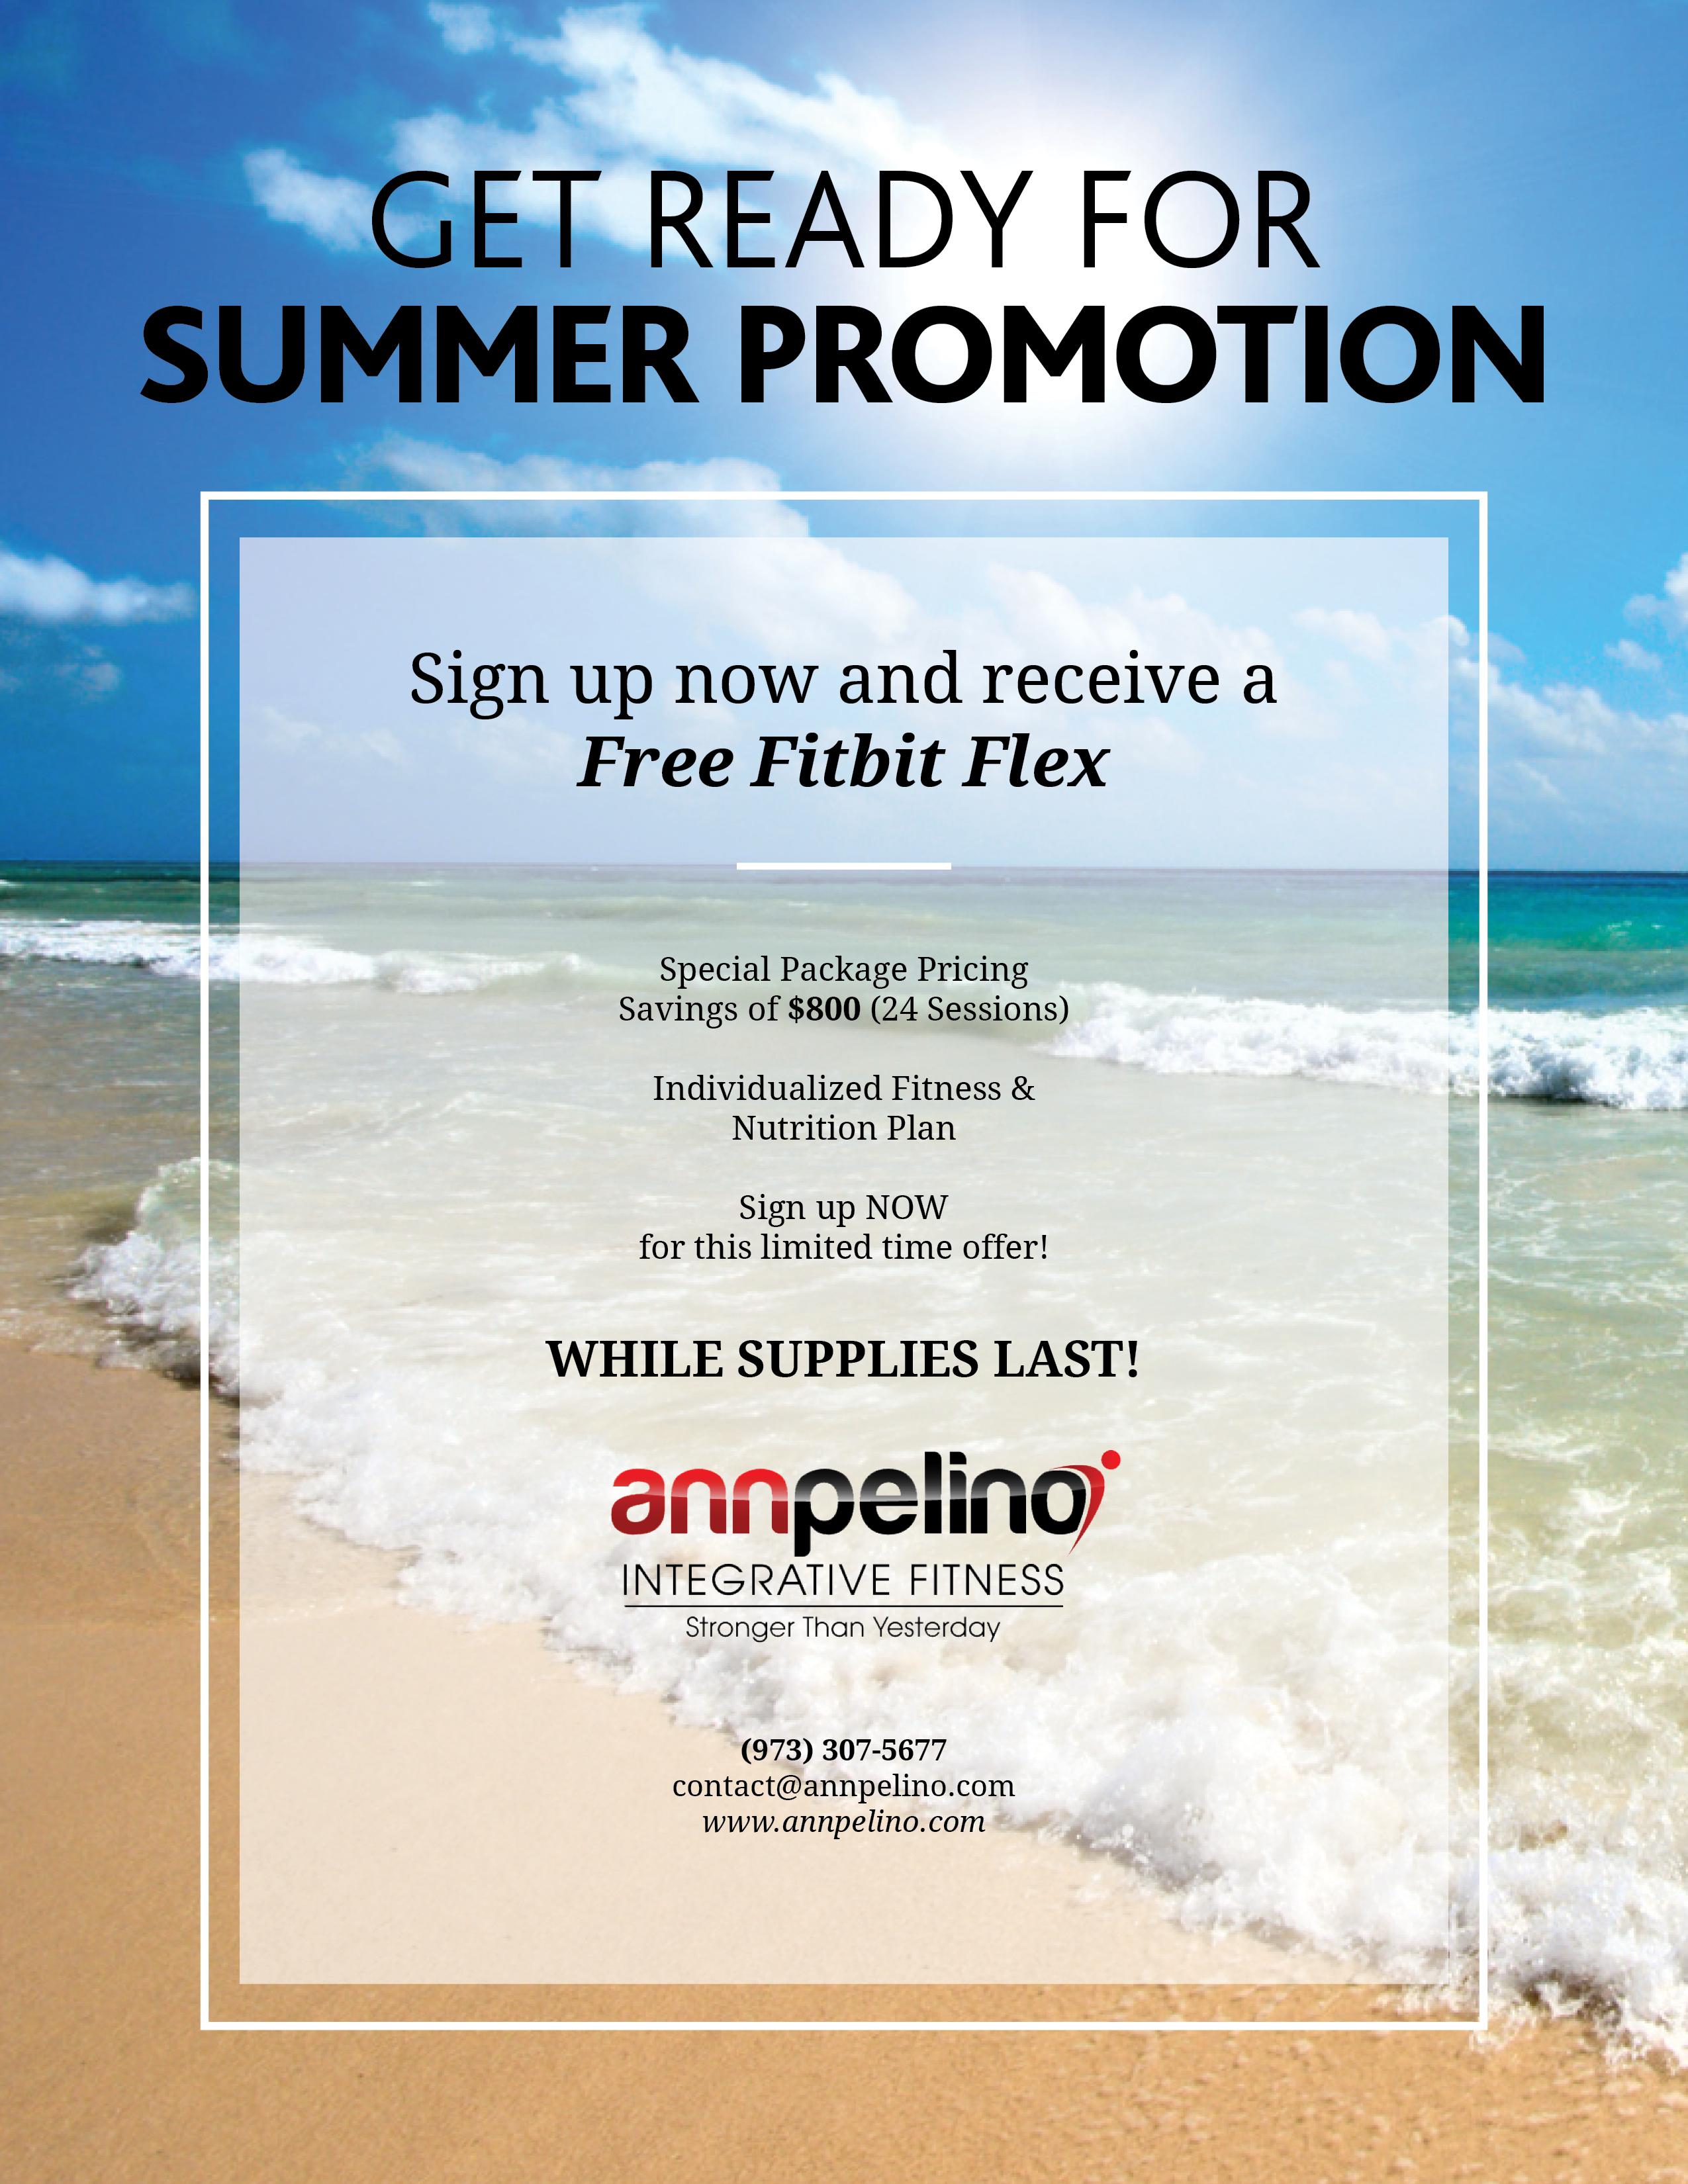 Ann Pelino Integrative Fitness